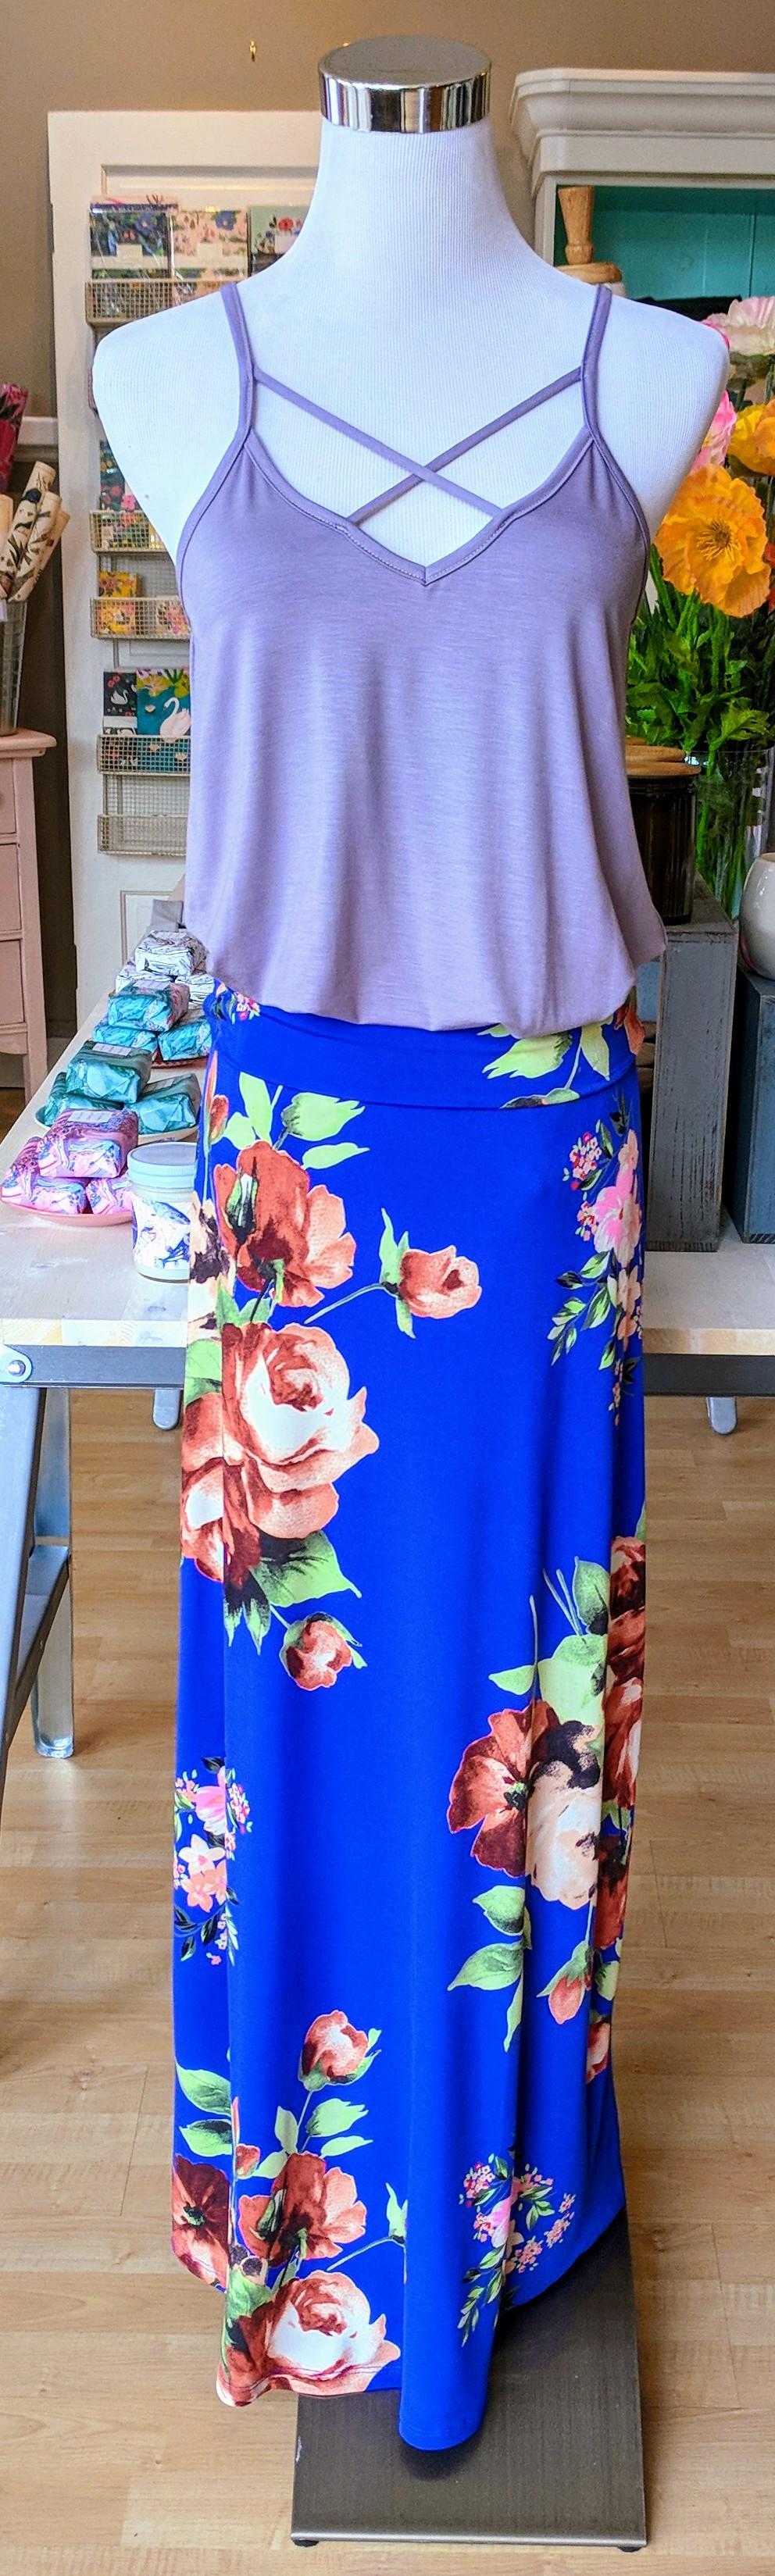 Royal floral maxi skirt with elastic waistband.